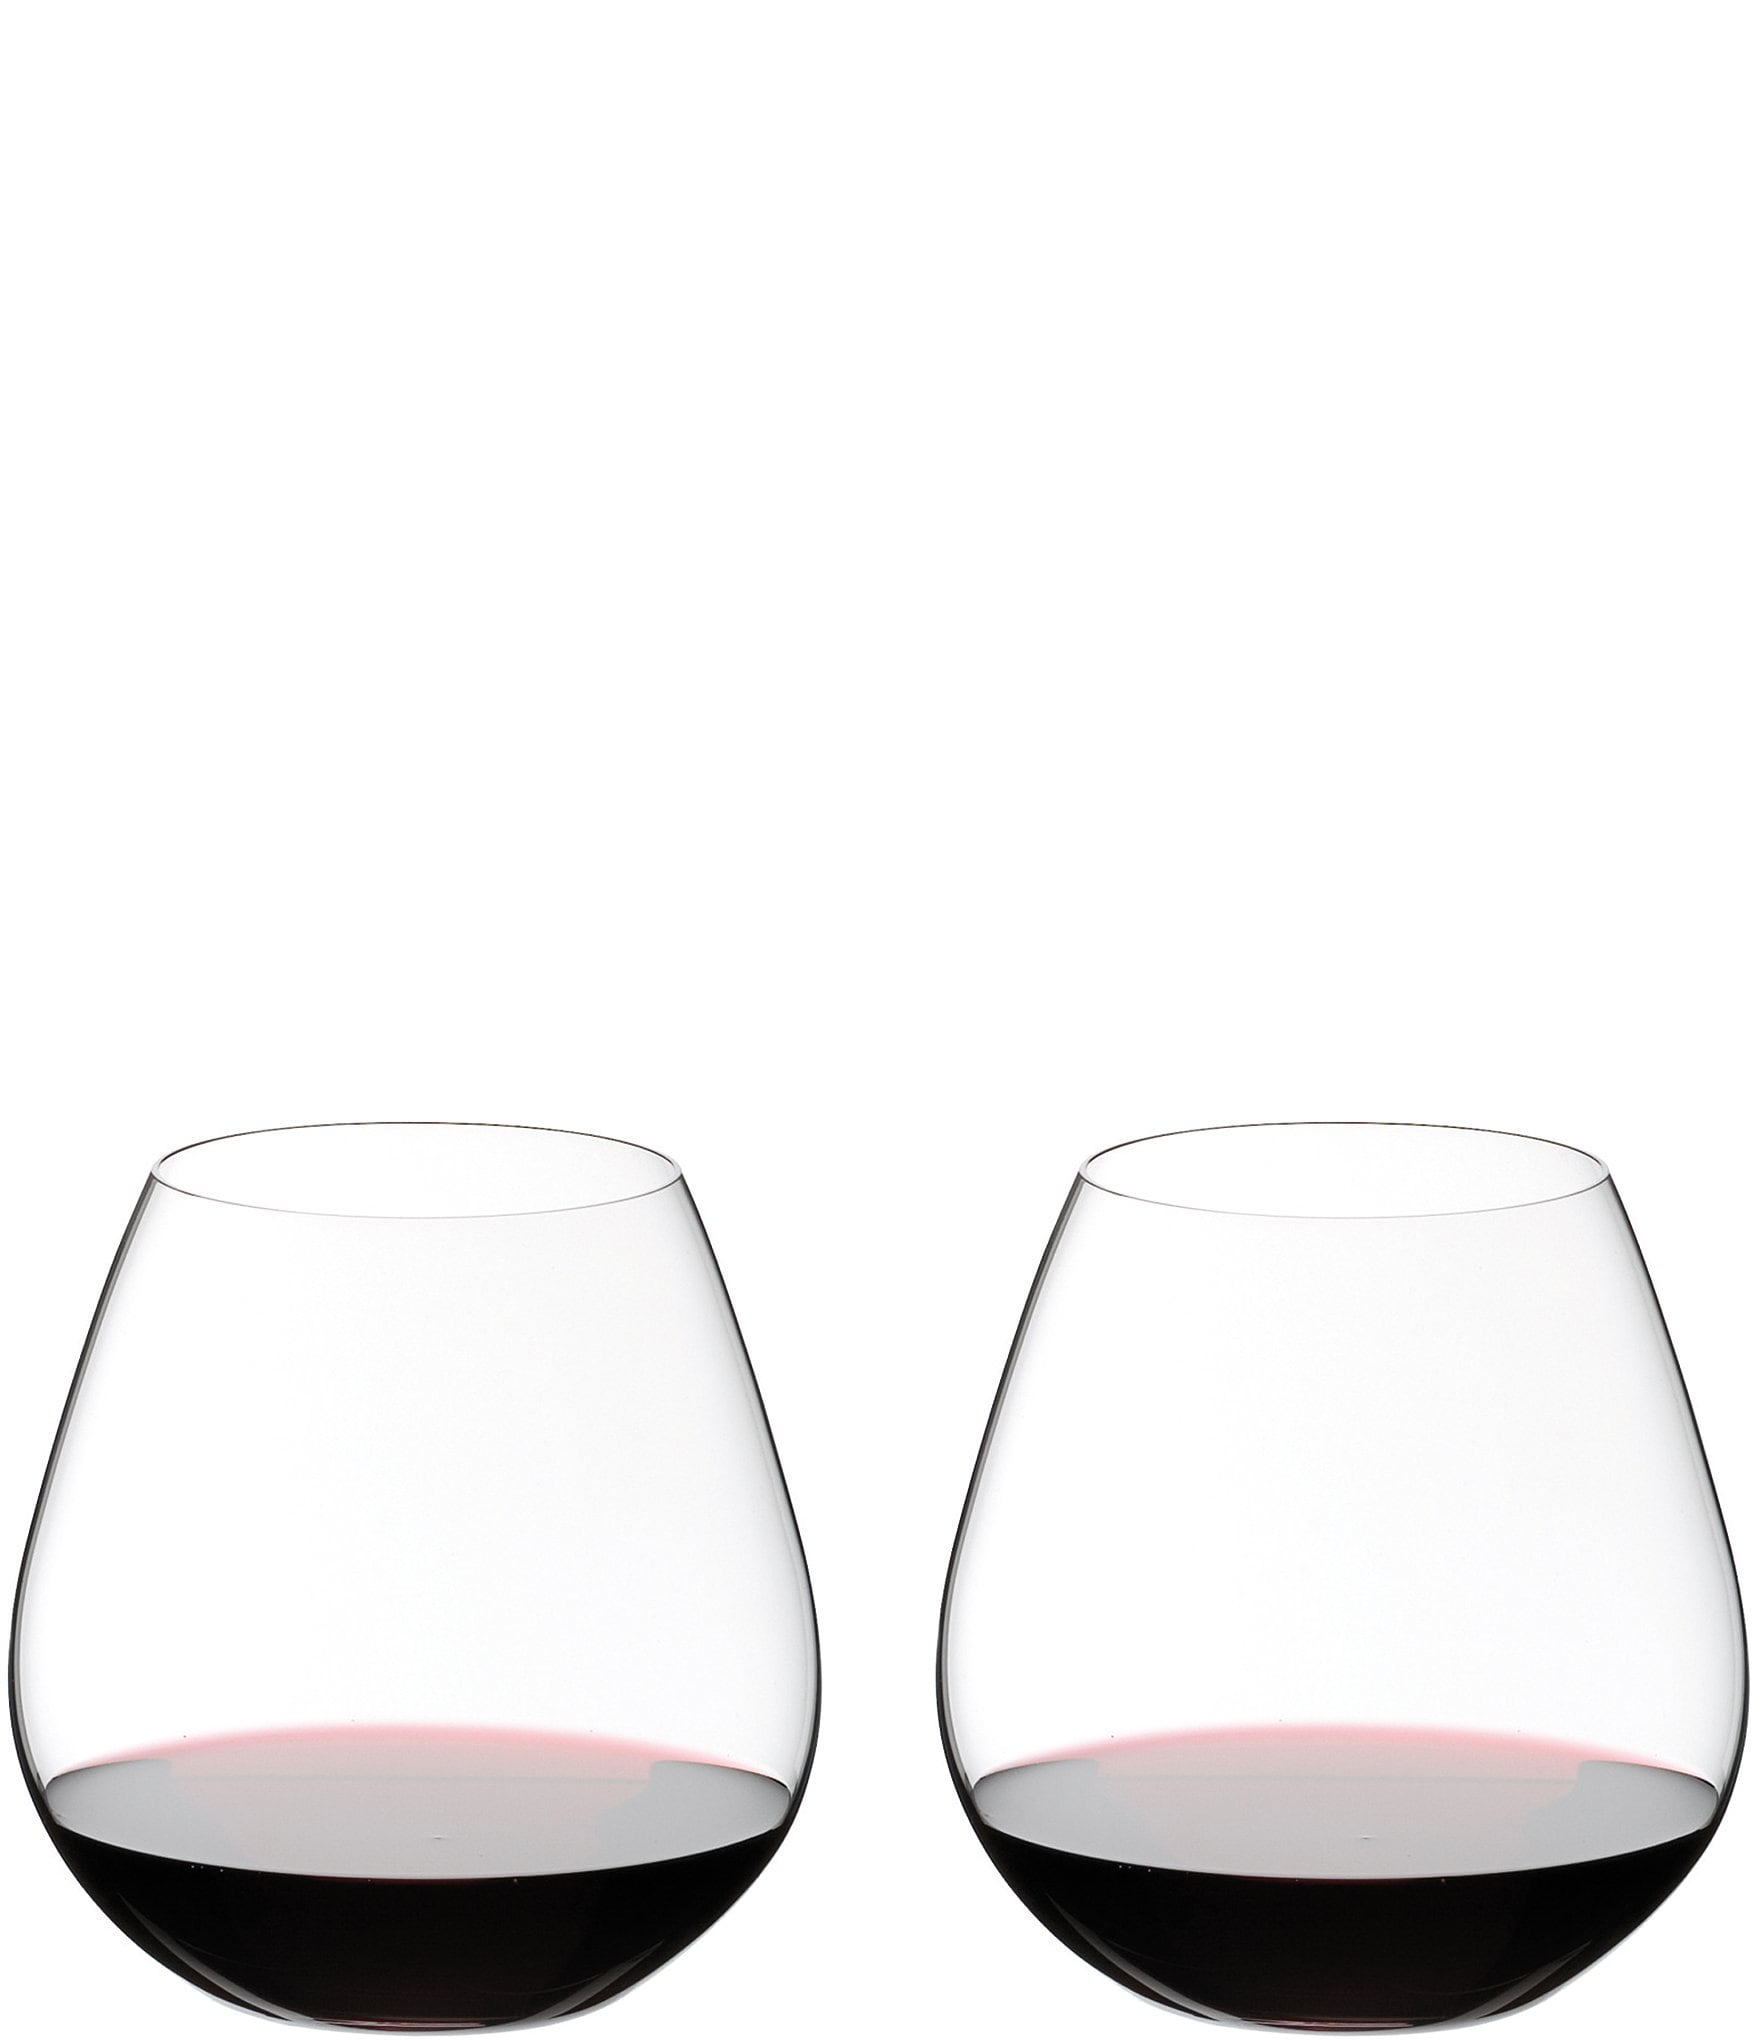 2ce80053275 Riedel O Wine Tumbler Pinot / Nebbiolo Glasses, Set of 2   Dillard's